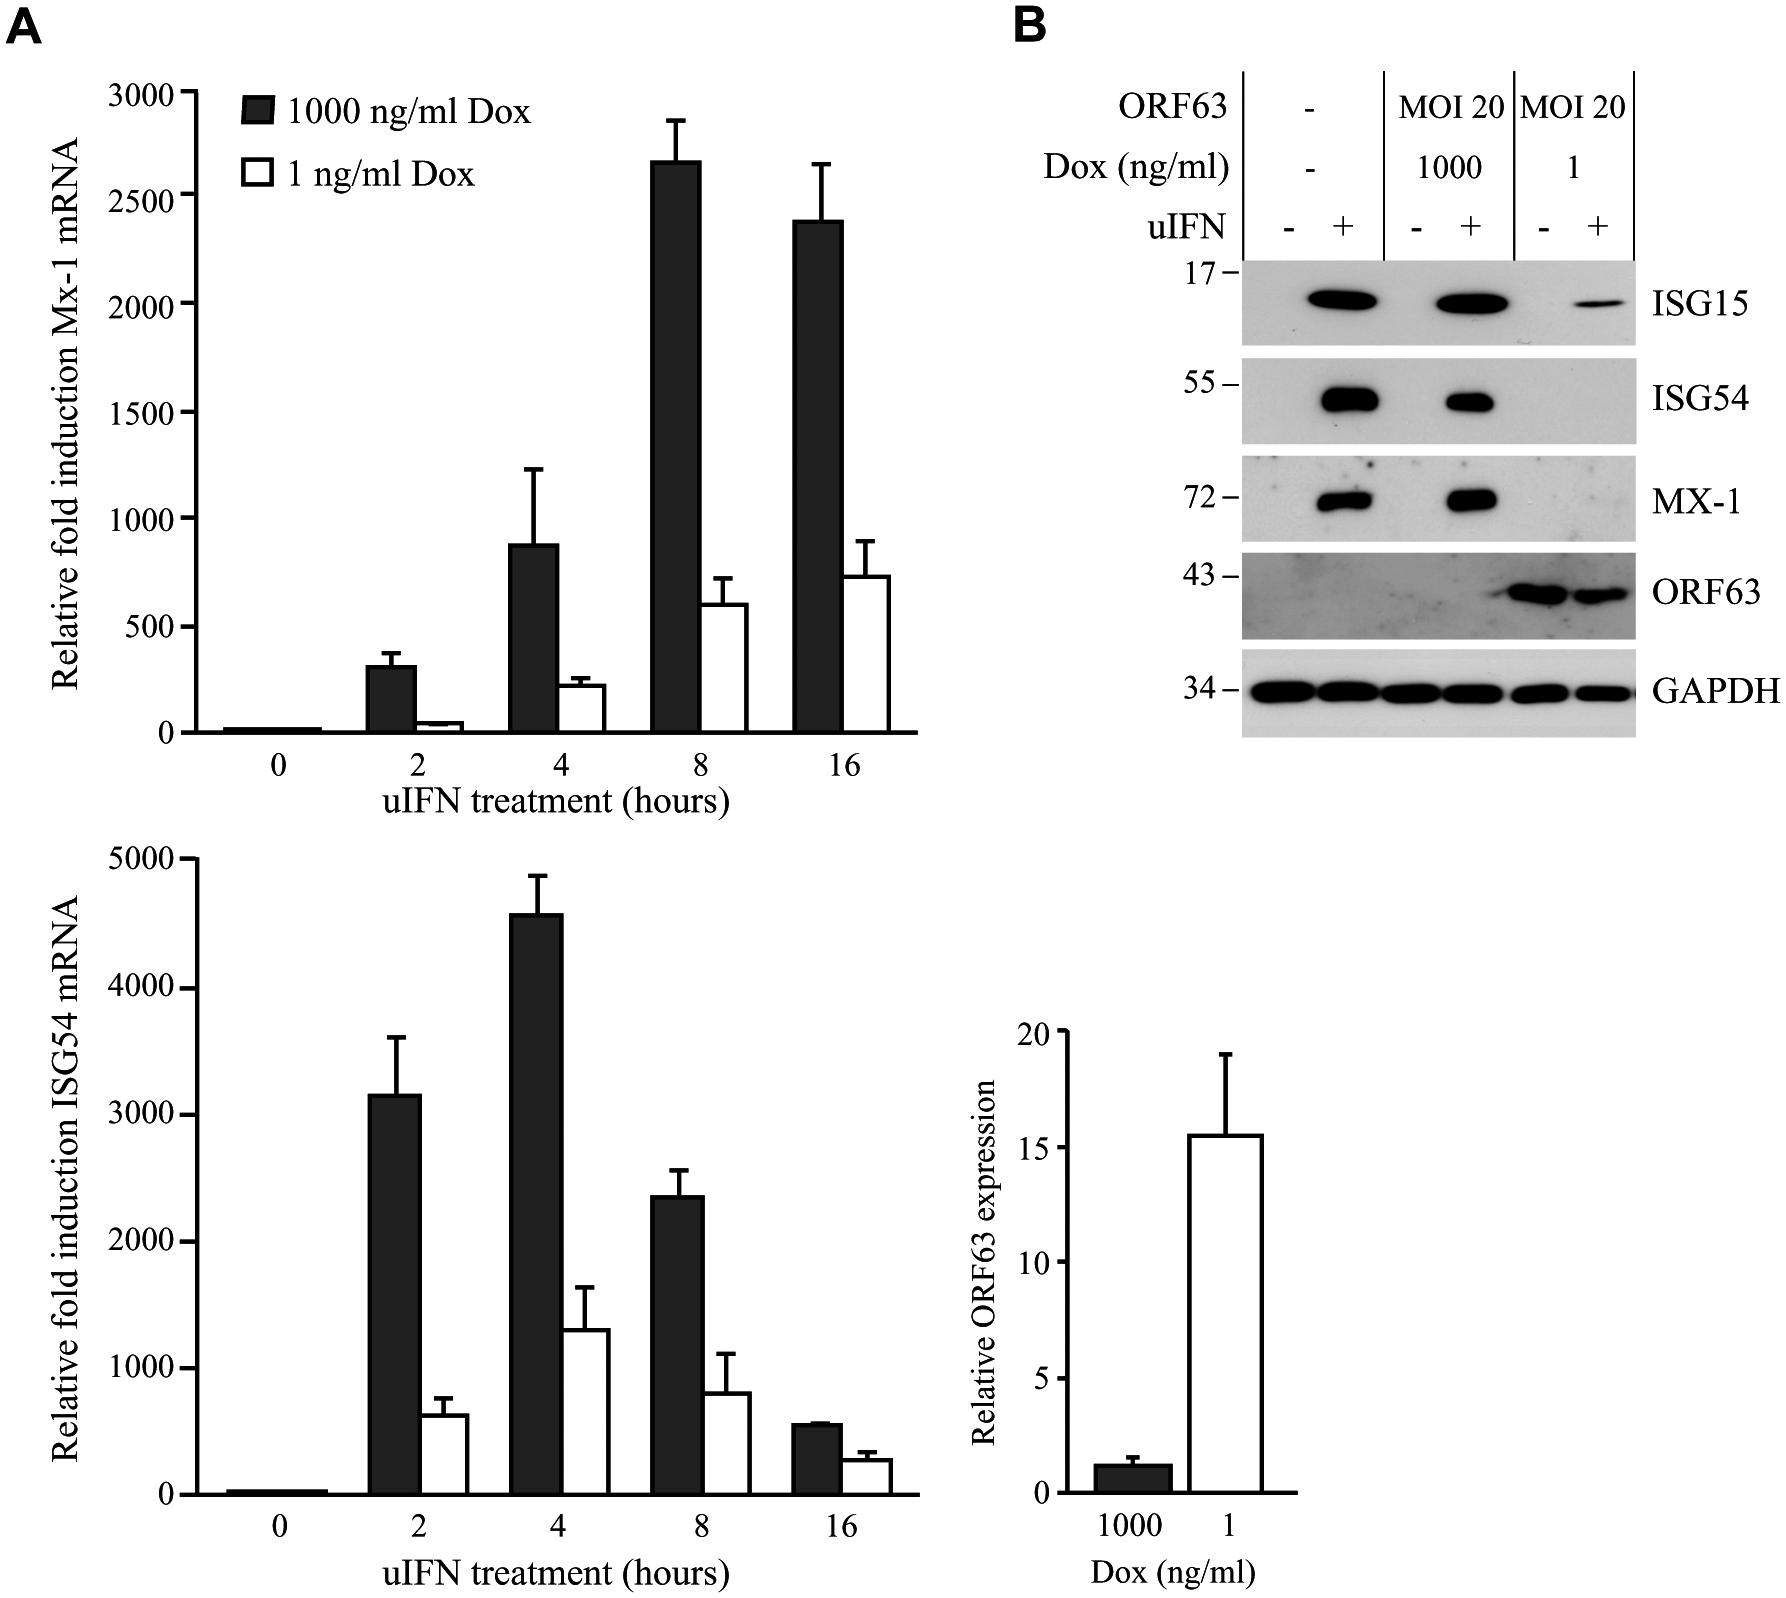 SVV ORF63 inhibits IFN-stimulated gene expression.